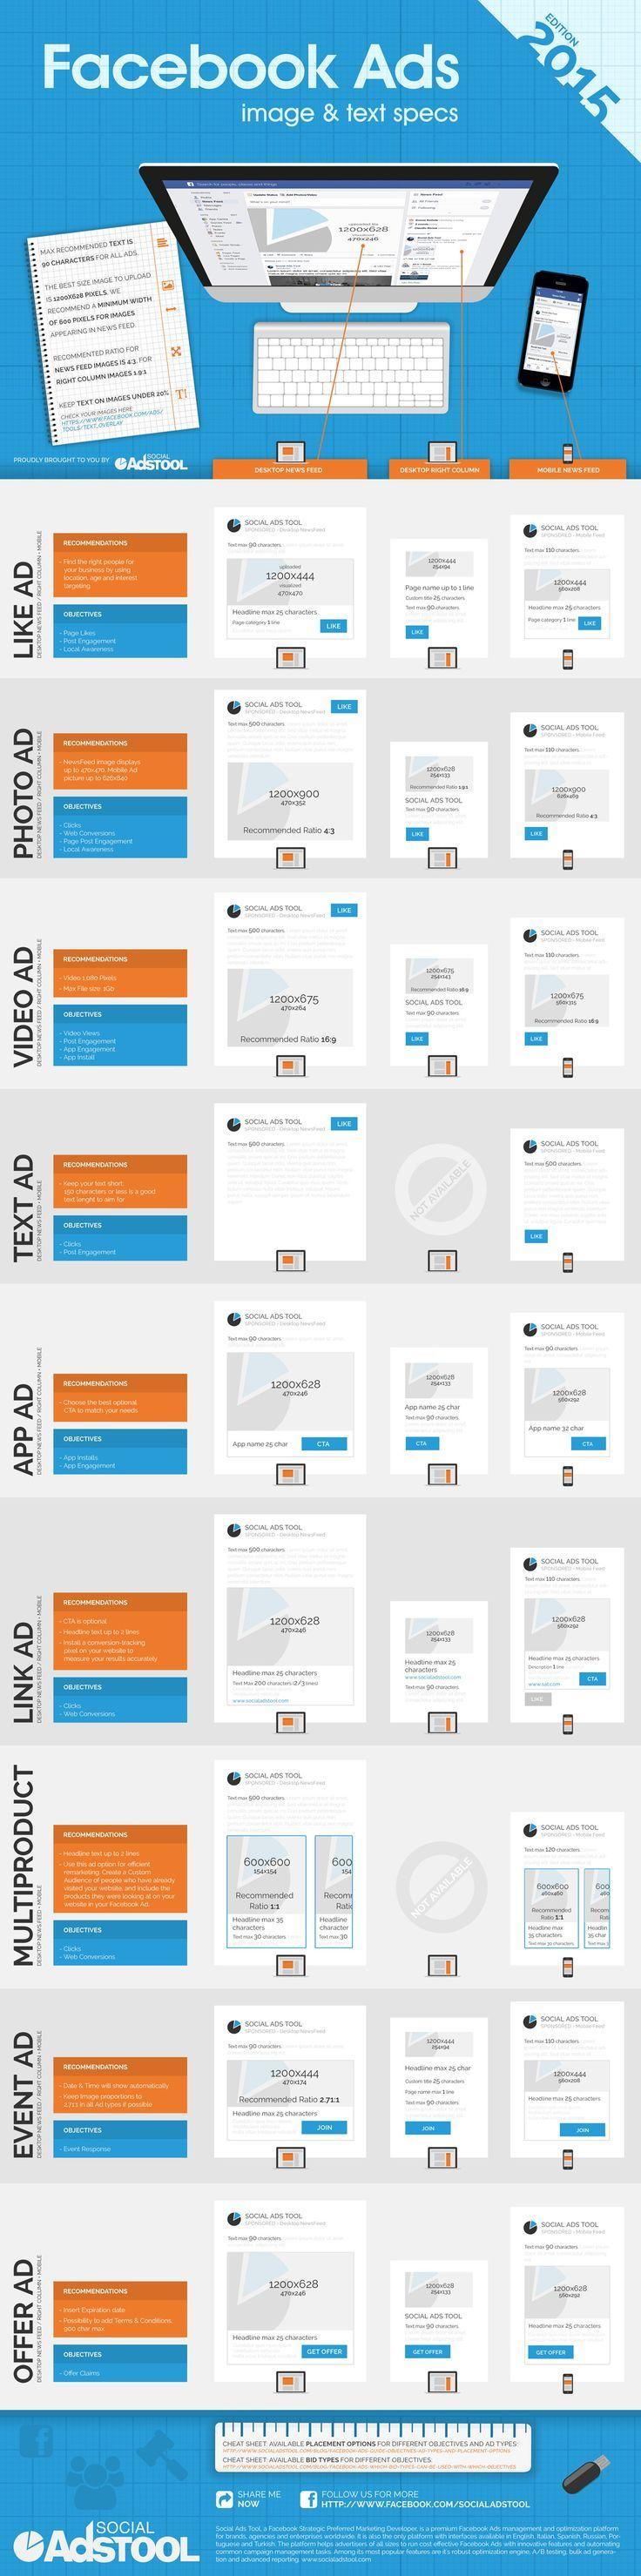 Social Ads Tool - InfoGraphic - Facebook Ads - Image & text specs - 2015 (scheduled via http://www.tailwindapp.com?utm_source=pinterest&utm_medium=twpin&utm_content=post777455&utm_campaign=scheduler_attribution)